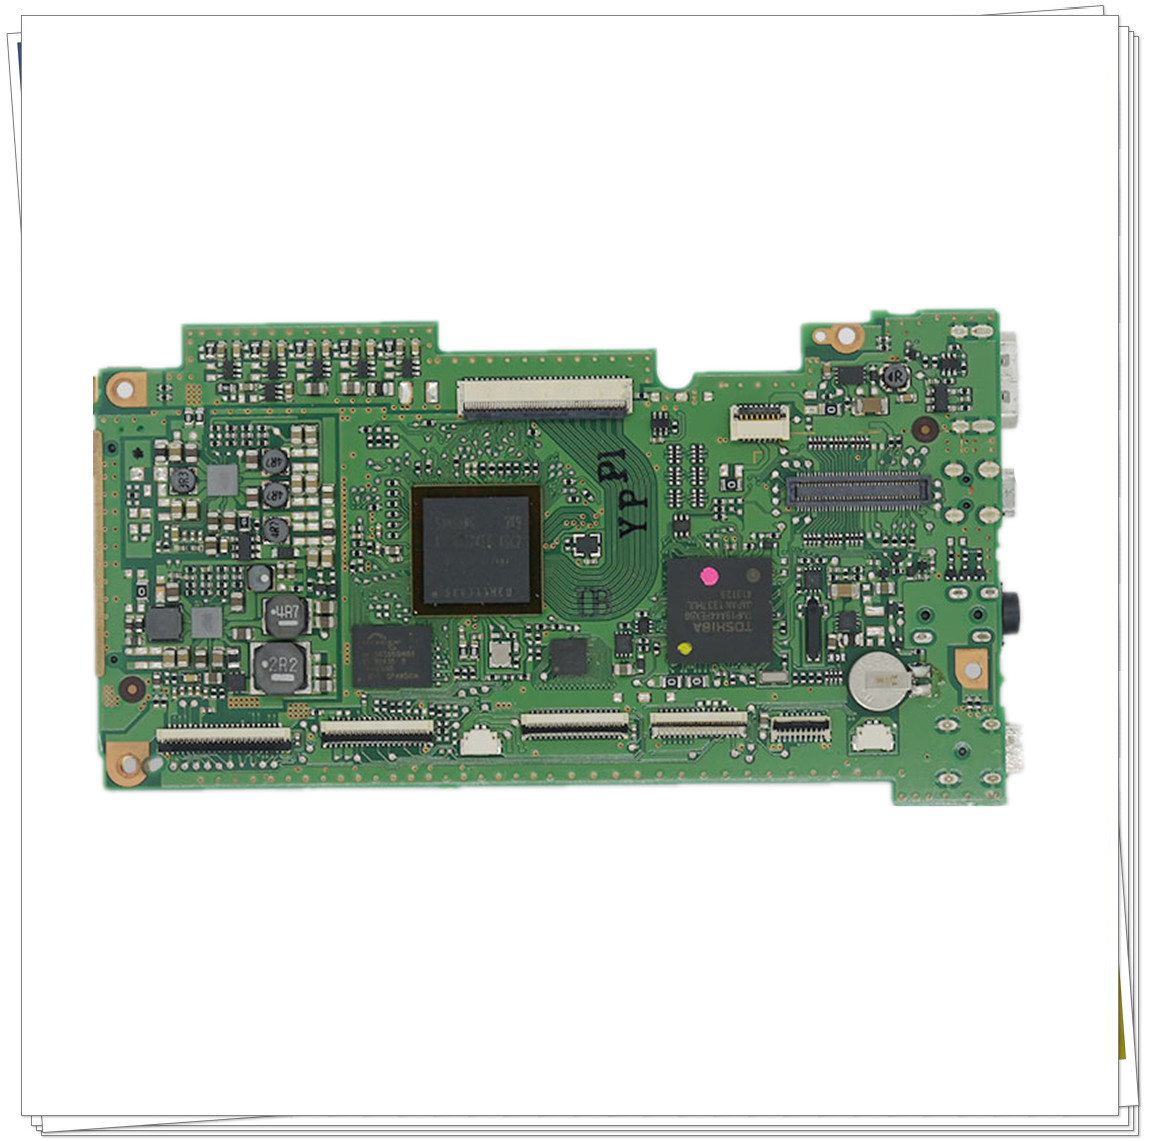 100% Original D3300 Motherboard For Nikon D3300 Main Board D3300 Mainboard Camera Repair